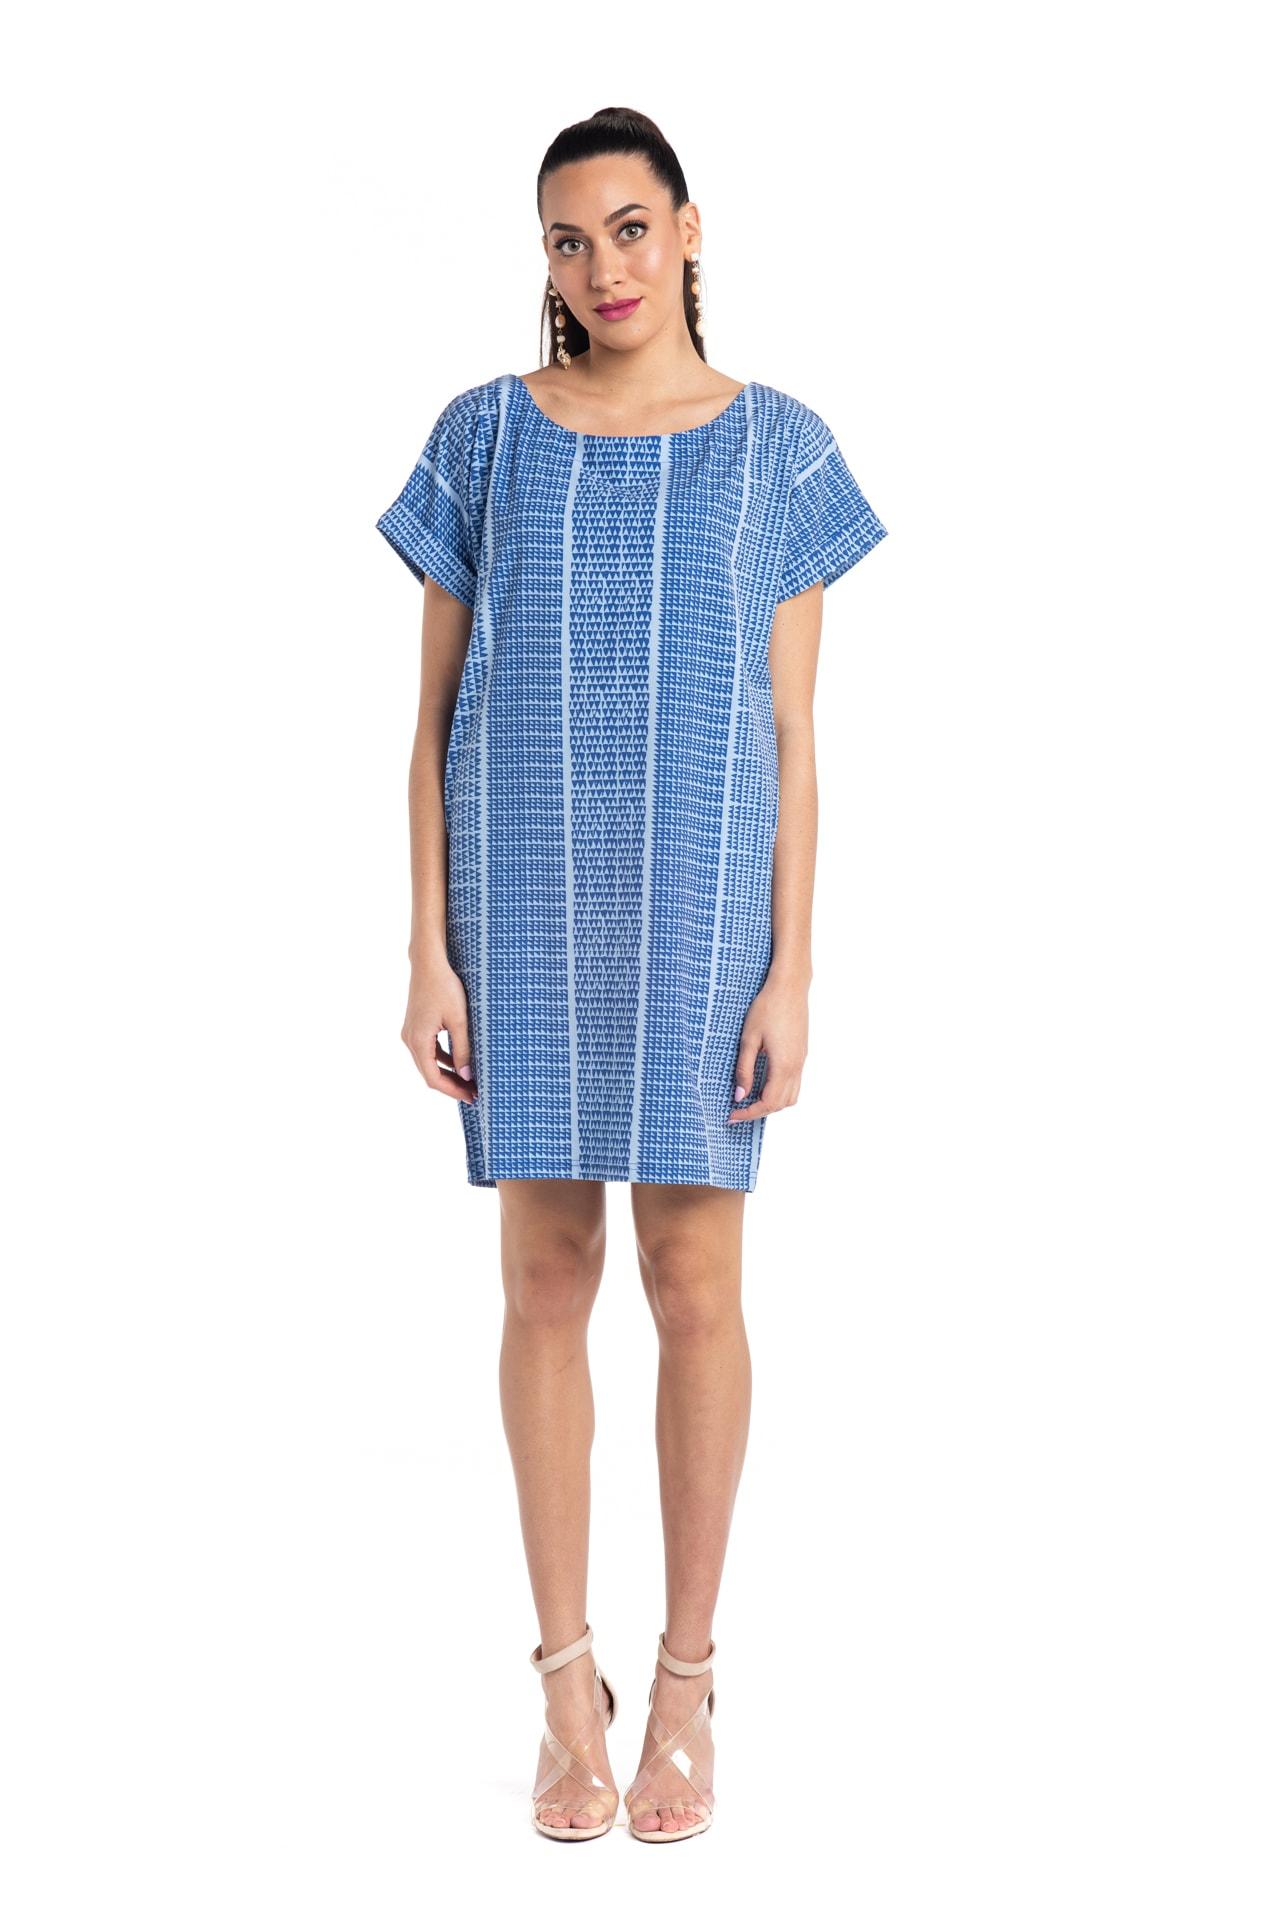 Model wearing Puaniu Shift Dress in Blue - Front View